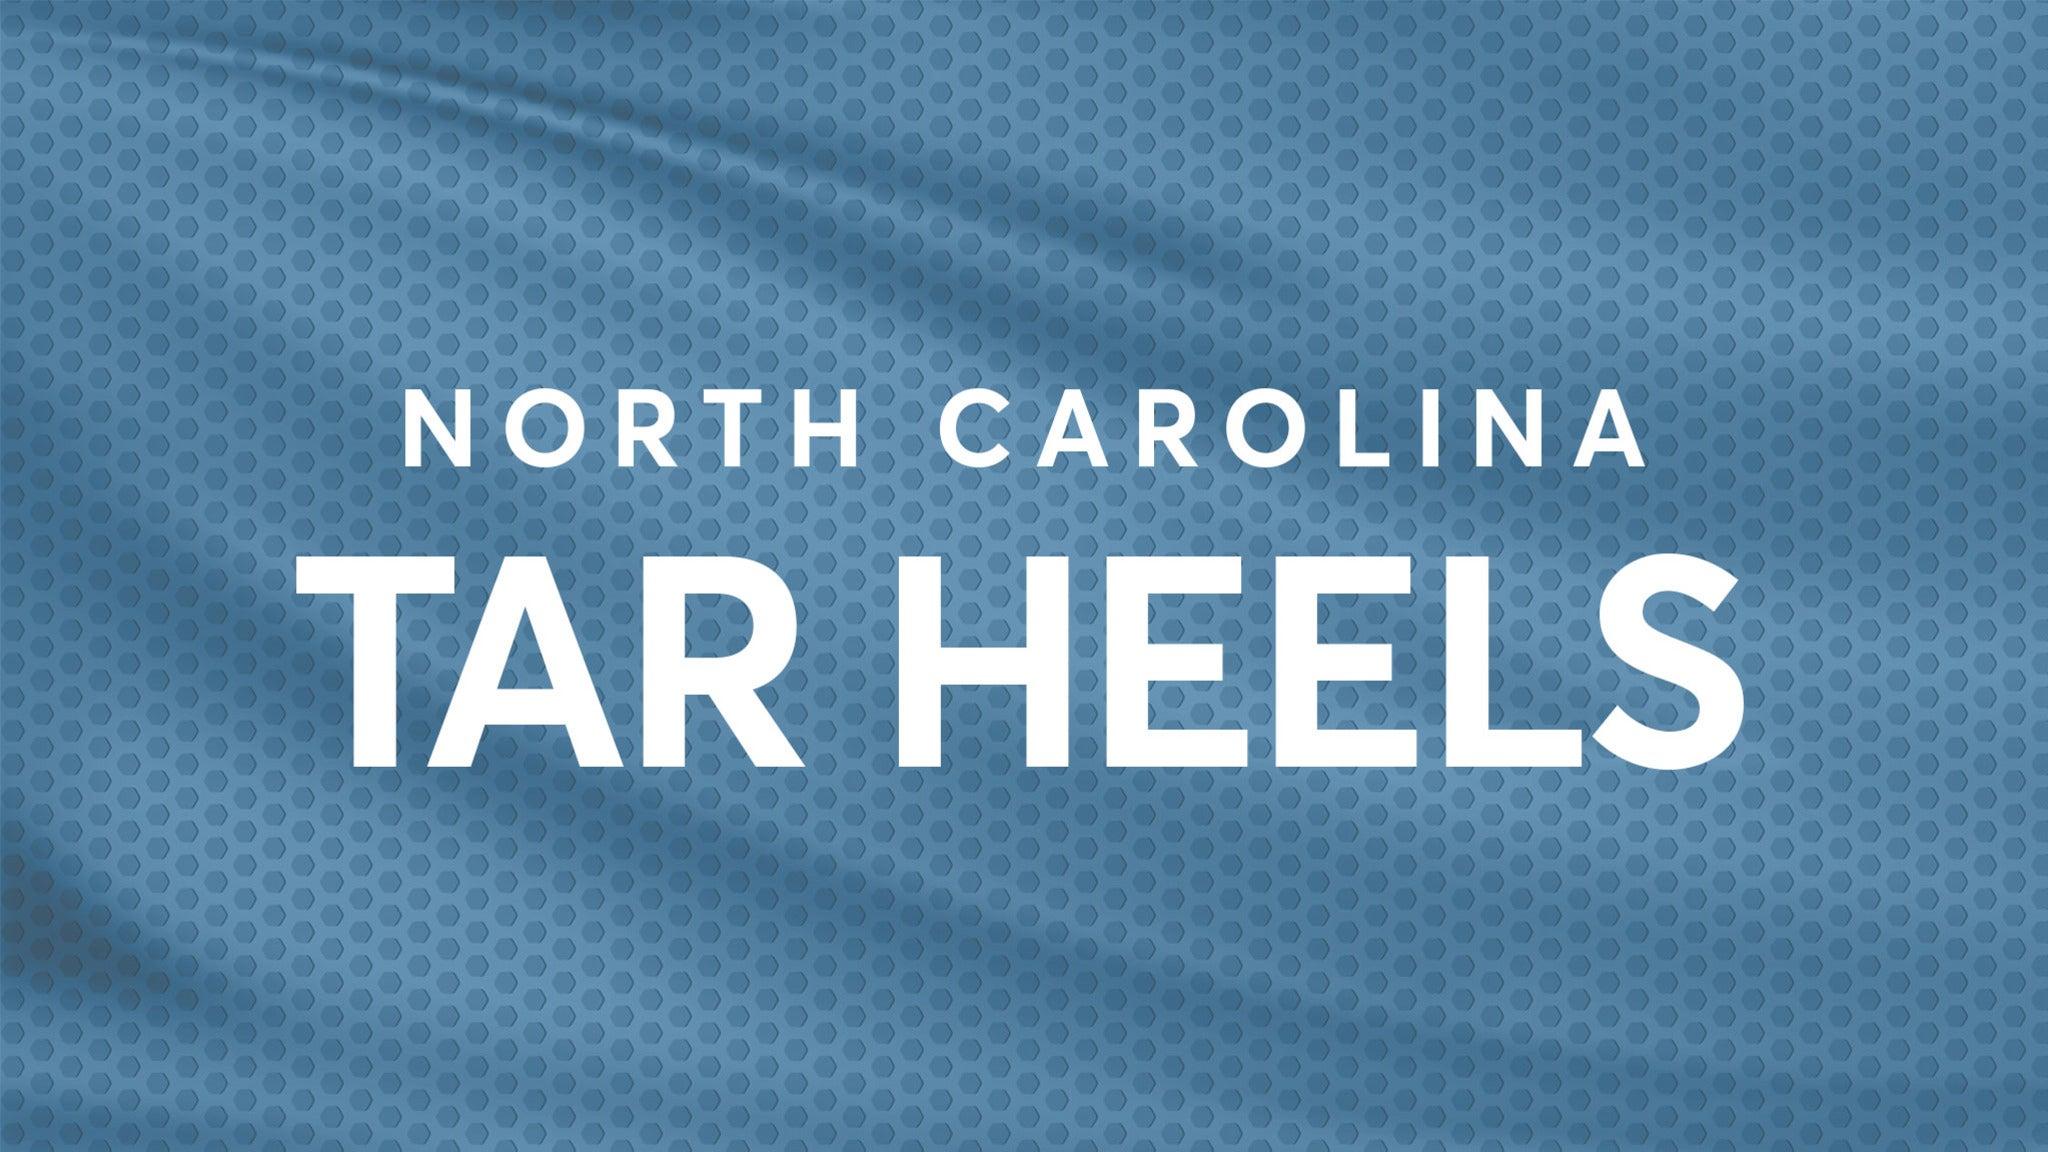 North Carolina Tar Heels Women's